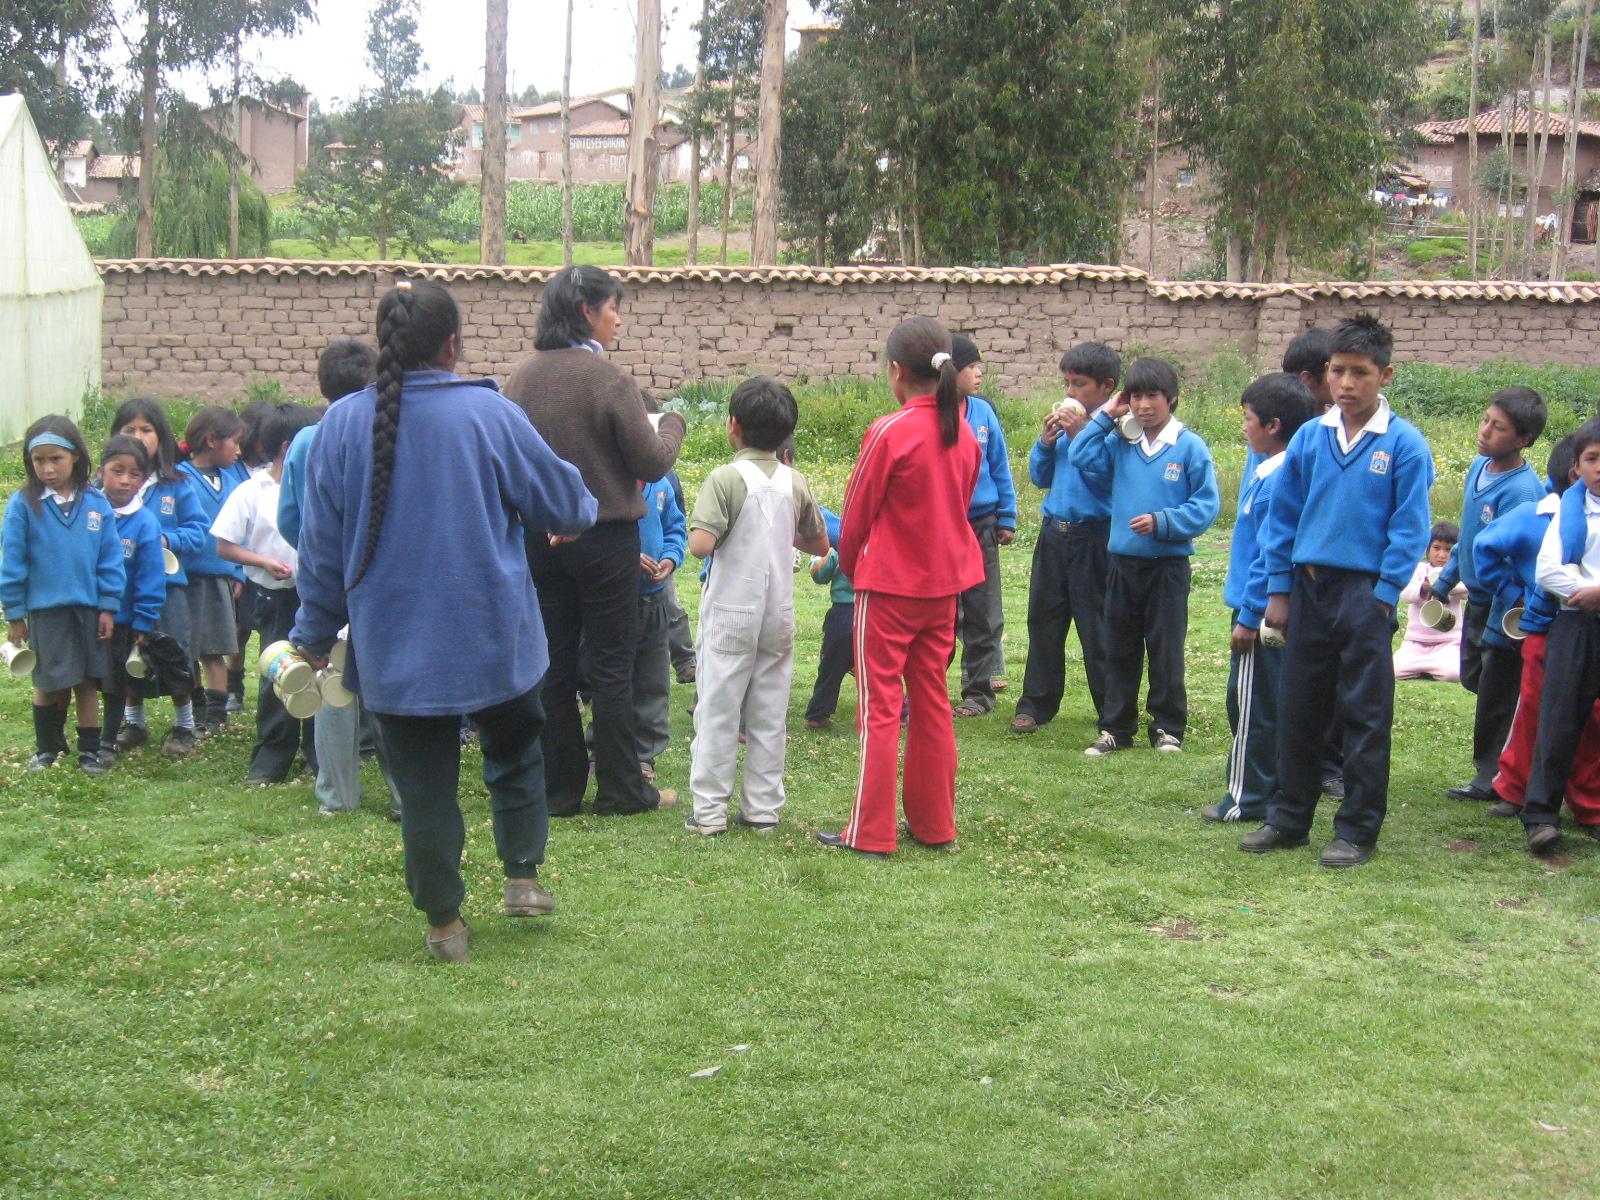 Kids in rural Peru whose native language is Quechua learn Spanish in school.